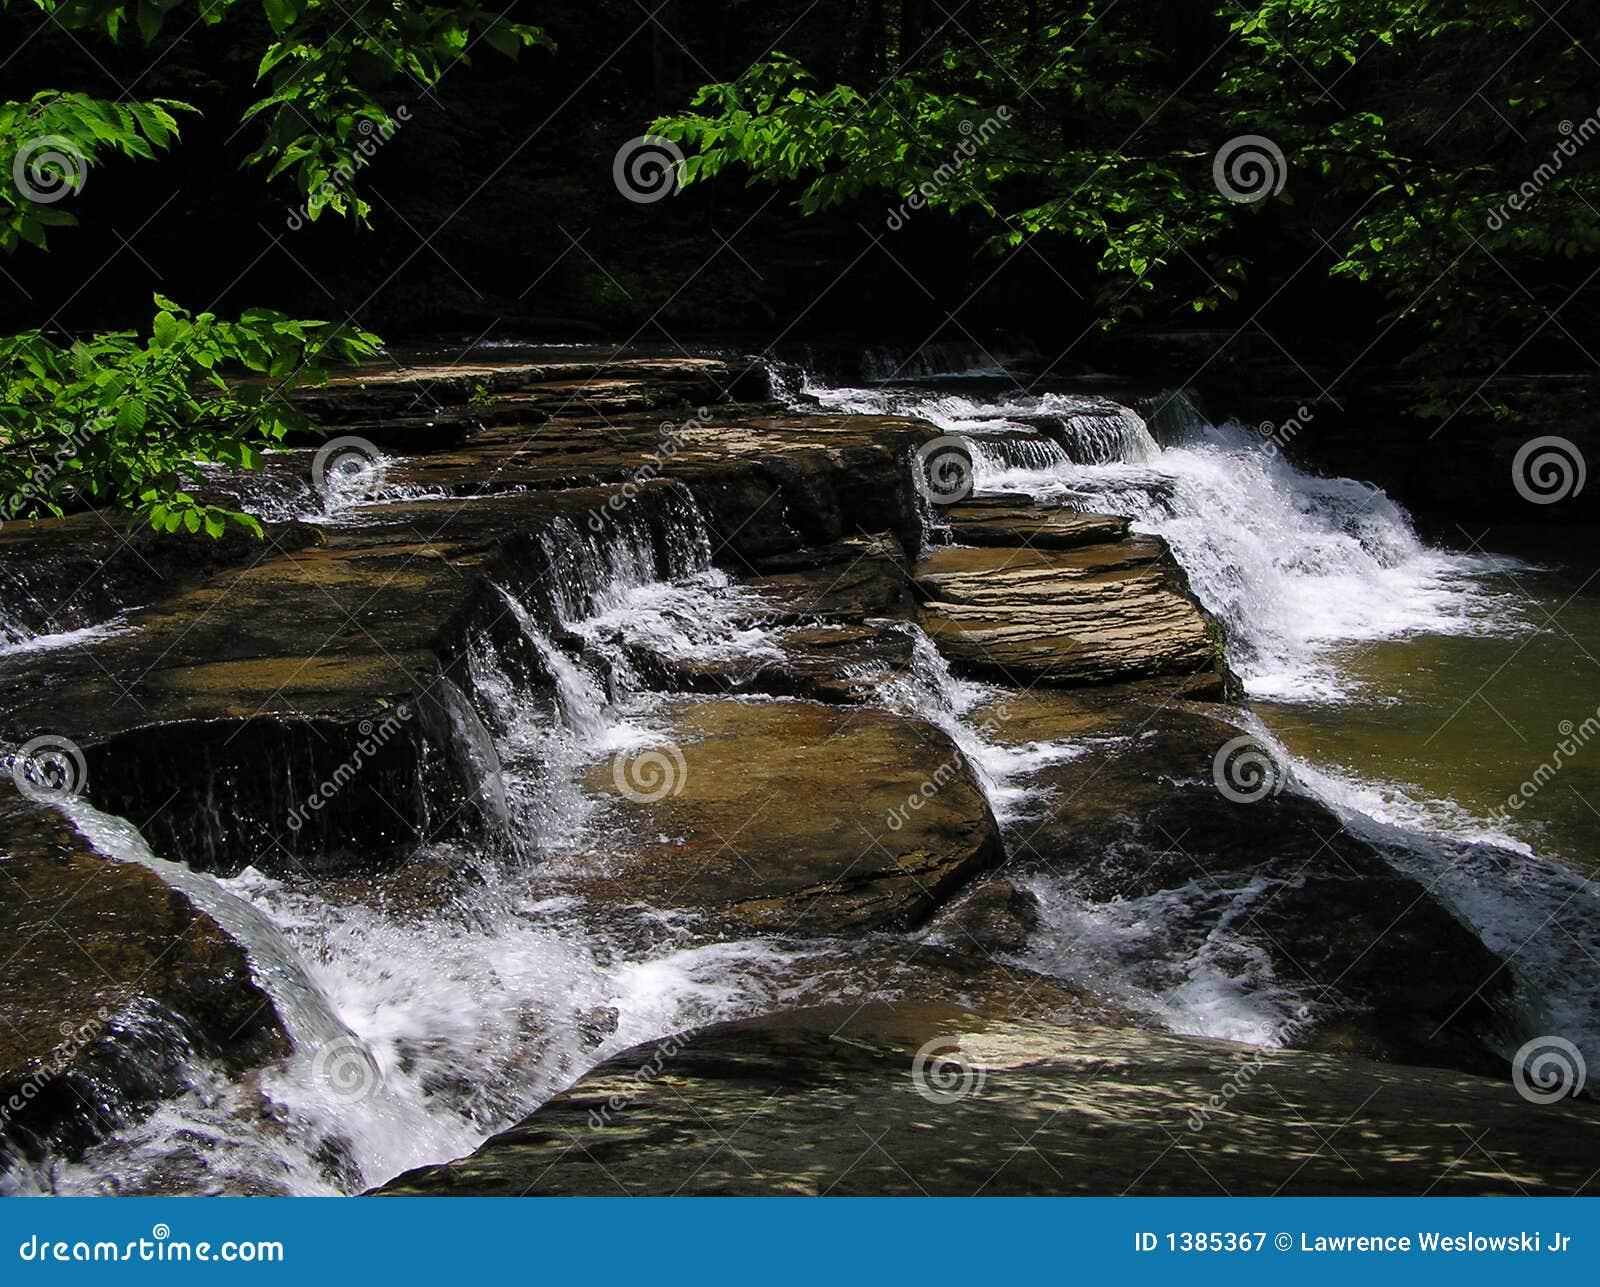 Campbell Creek Falls, Camp Creek State Park, West Virginia